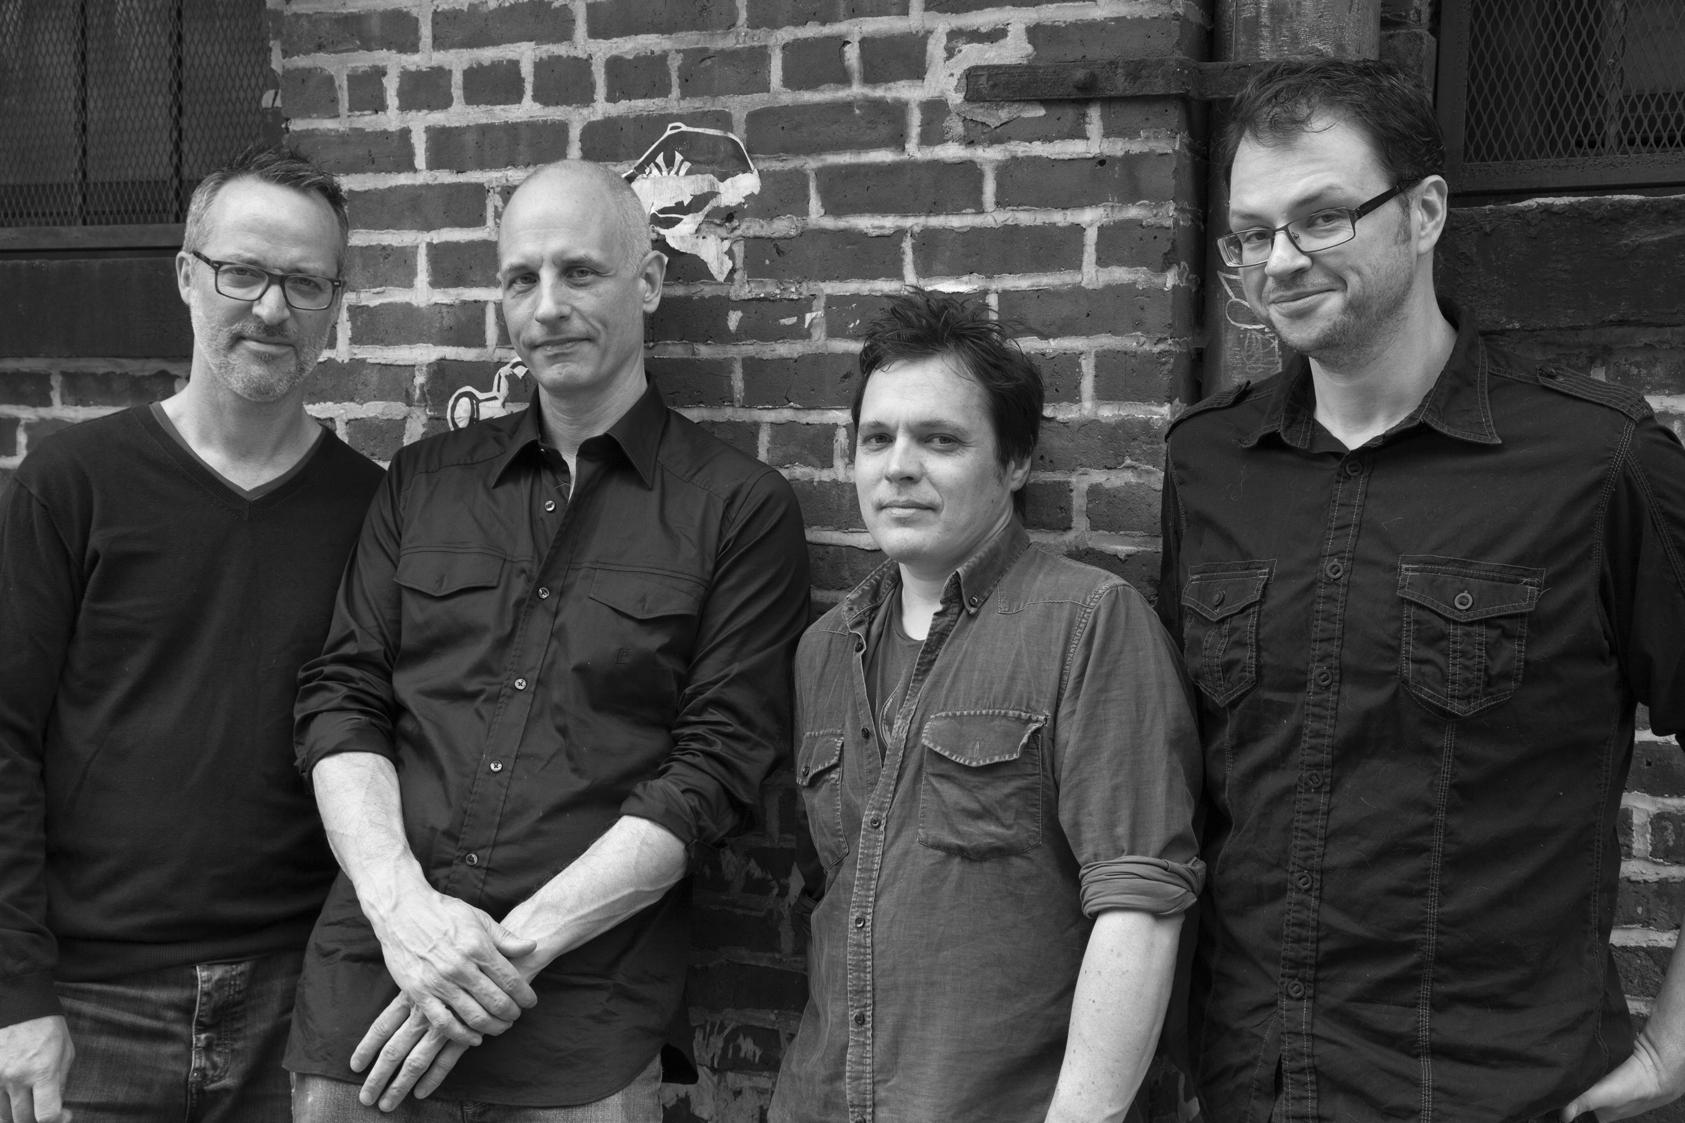 Michael Sarin, Erik Friedlander, Trevor Dunn & Doug Wamble outside The Bunker Studios in Brooklyn